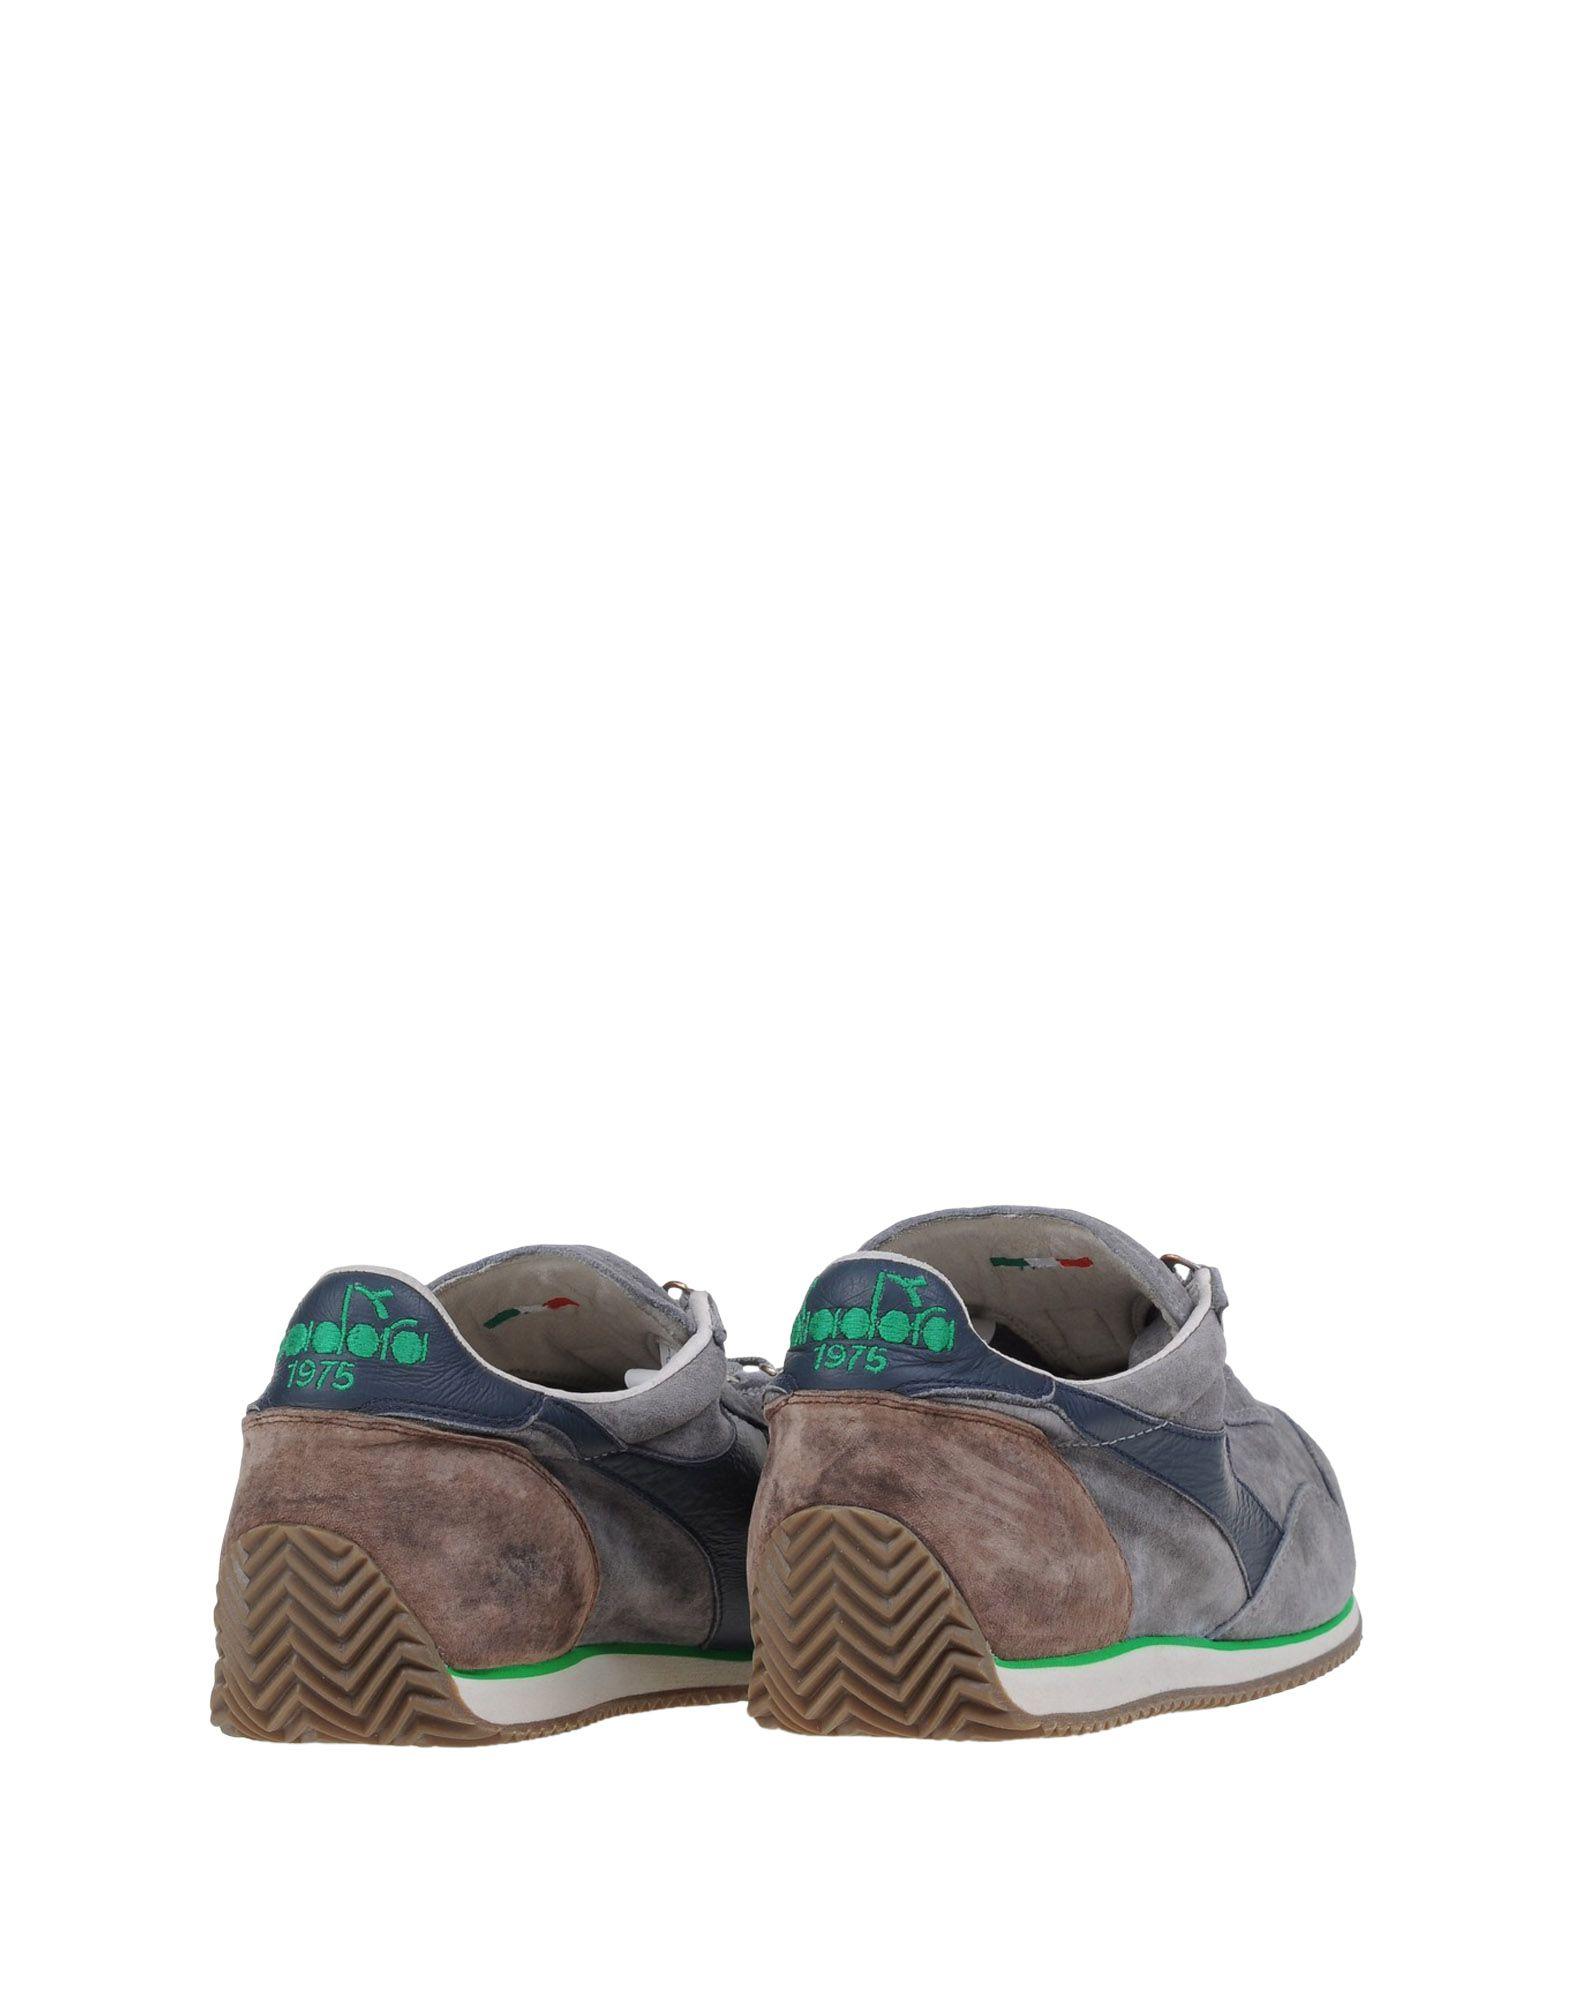 Sneakers Diadora Heritage Equipe S. Sw - Homme - Sneakers Diadora Heritage sur